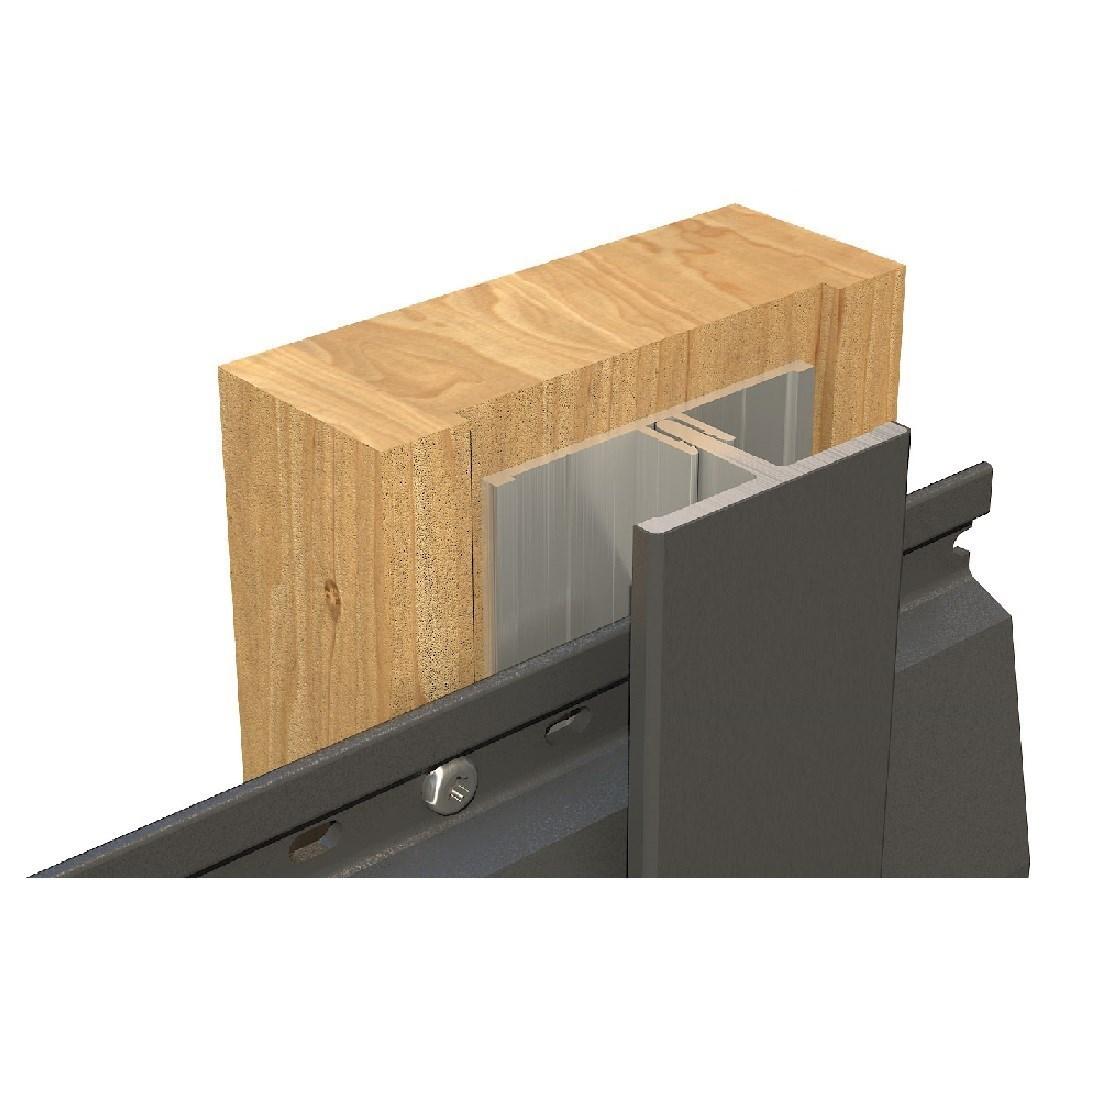 Gevelit PVC Verbindingsprofiel Cremewit 1379 l=4m